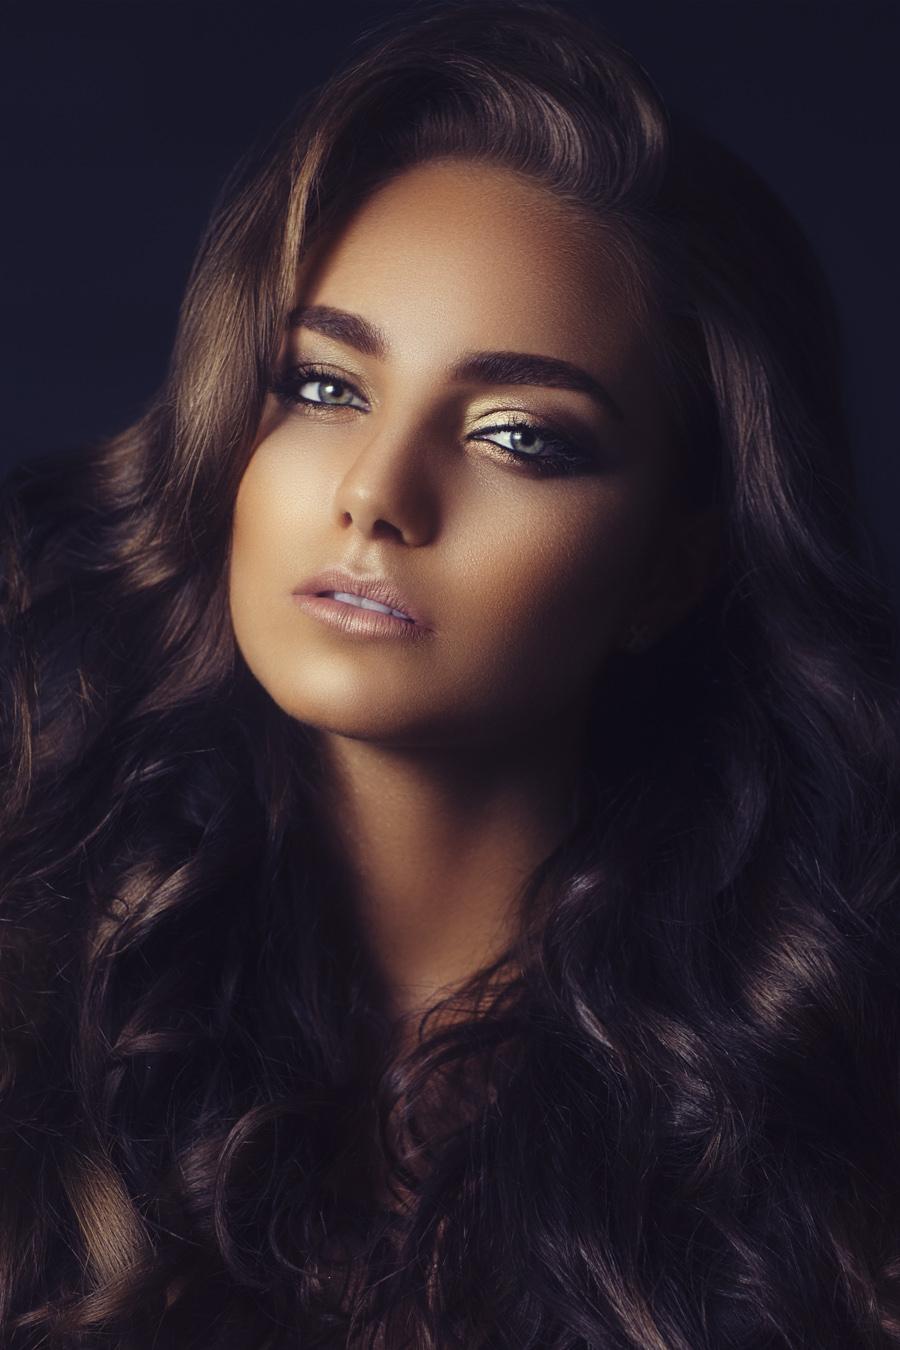 Beauty-Exclusive-Black-Beauty-